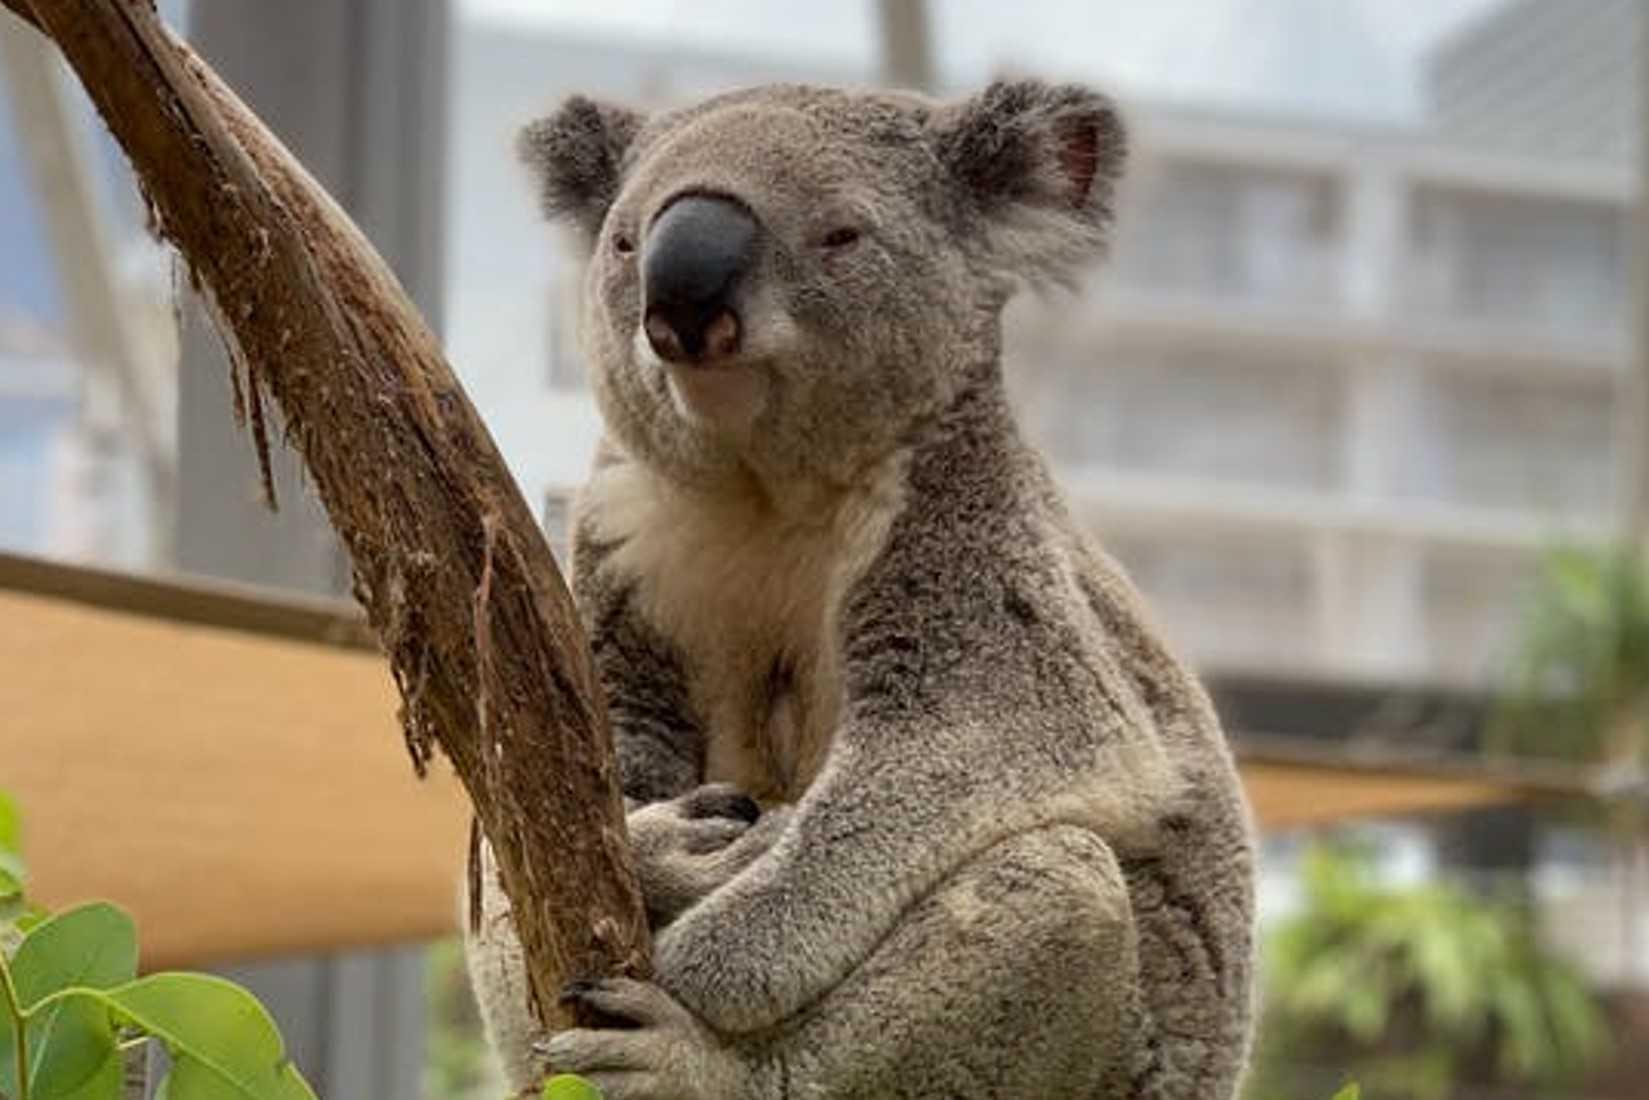 Hug Cuddly Creatures at a Koala Park Sanctuary